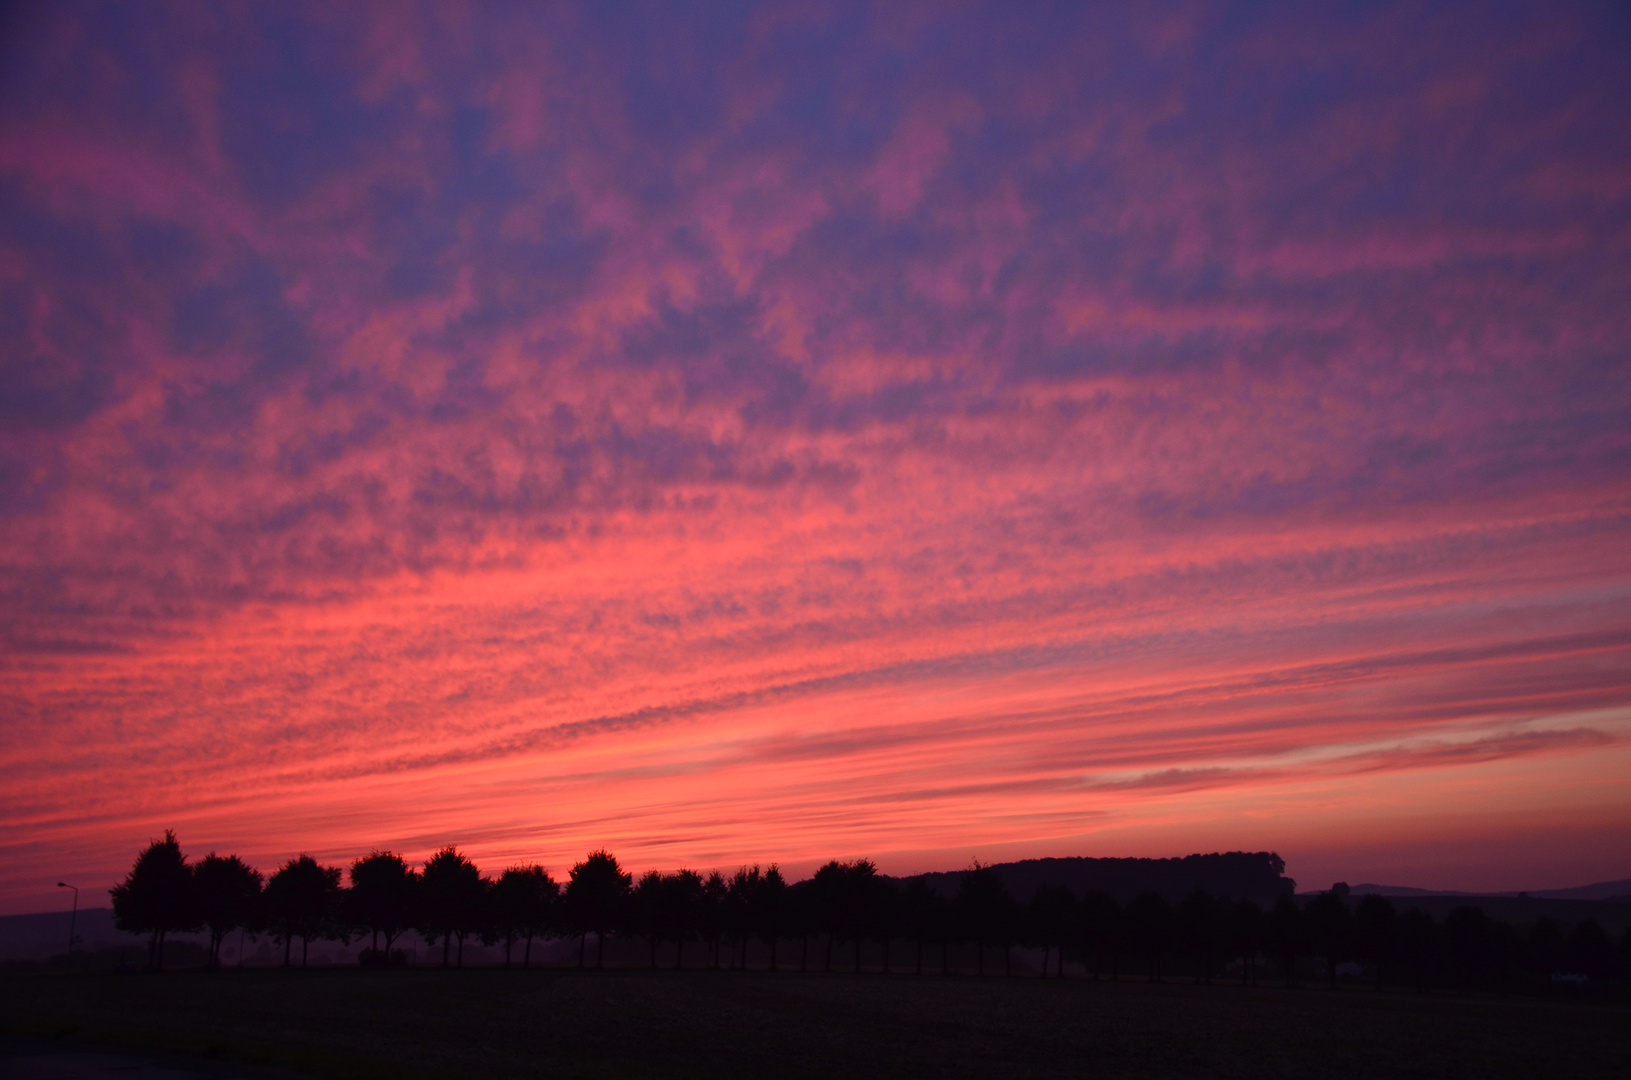 Barntruper Sonnenuntergang